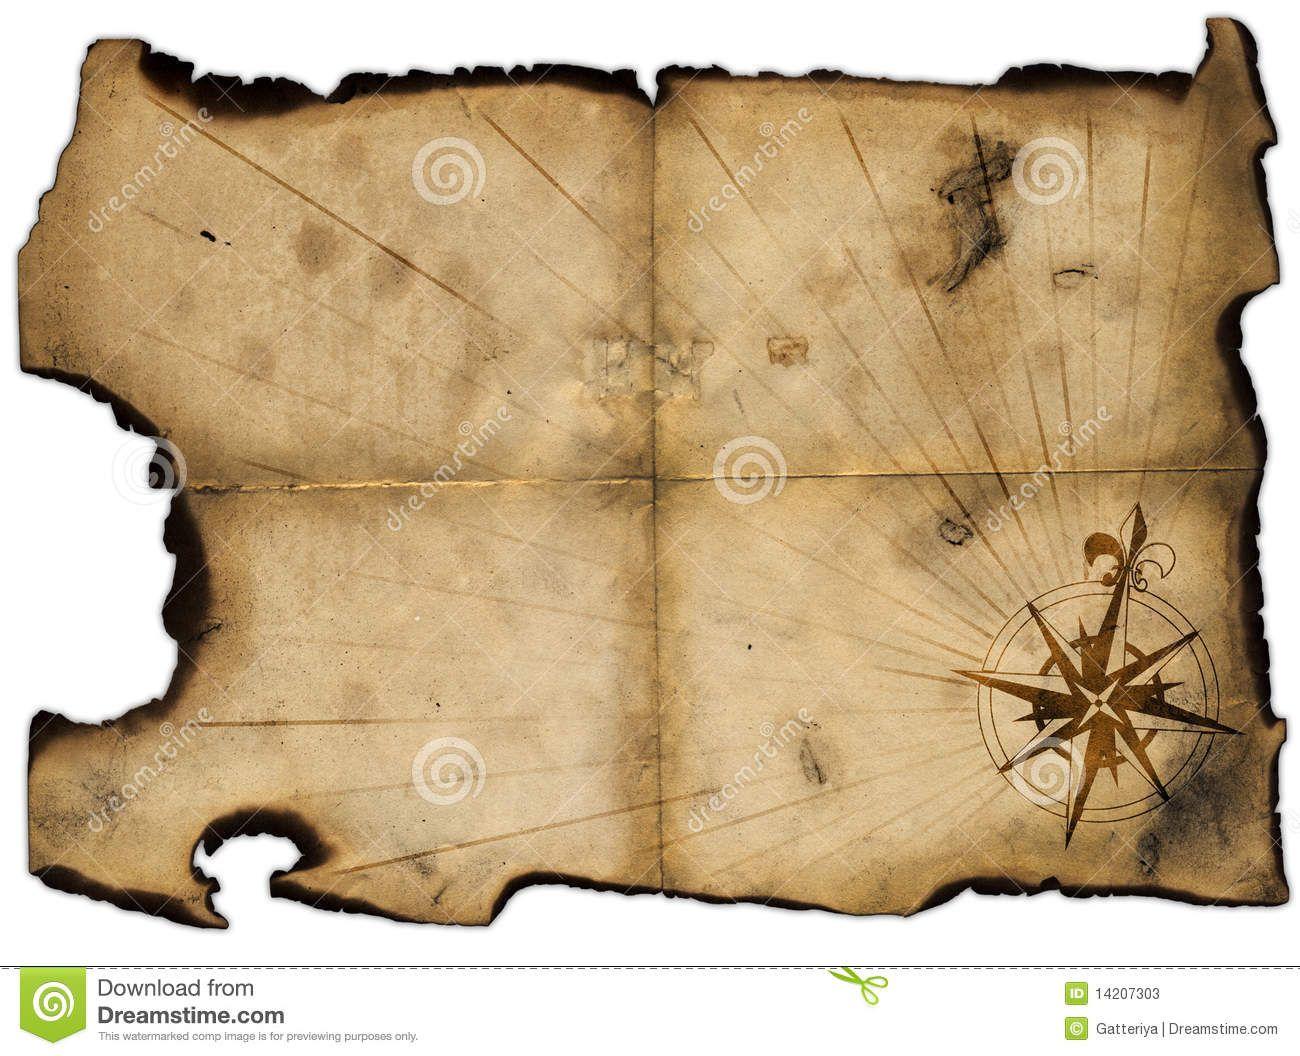 Blank Treasure Map Template Videotekaalex Kids Crafts